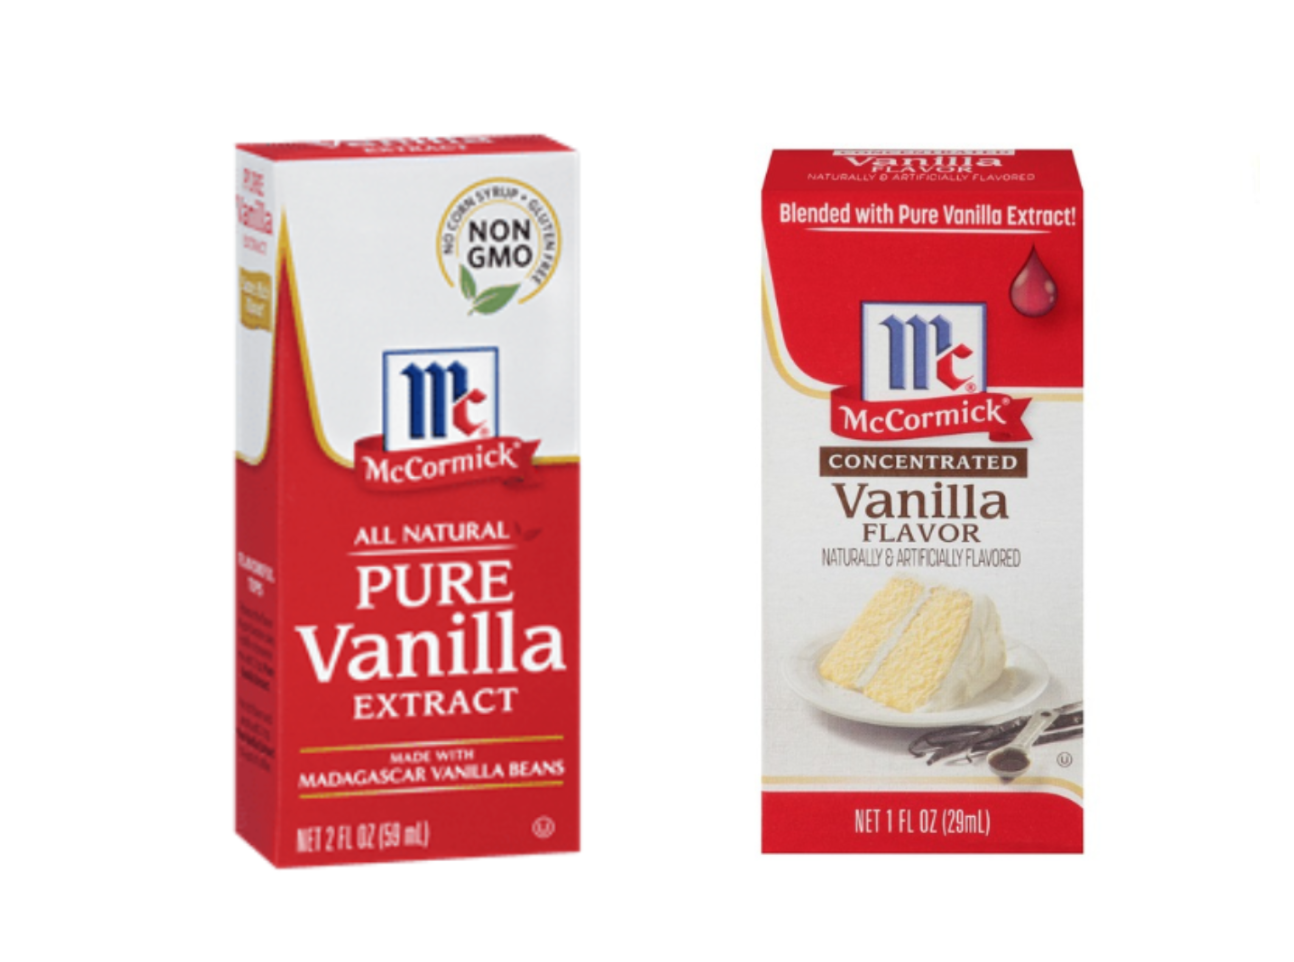 Vanilla vs Vanilla